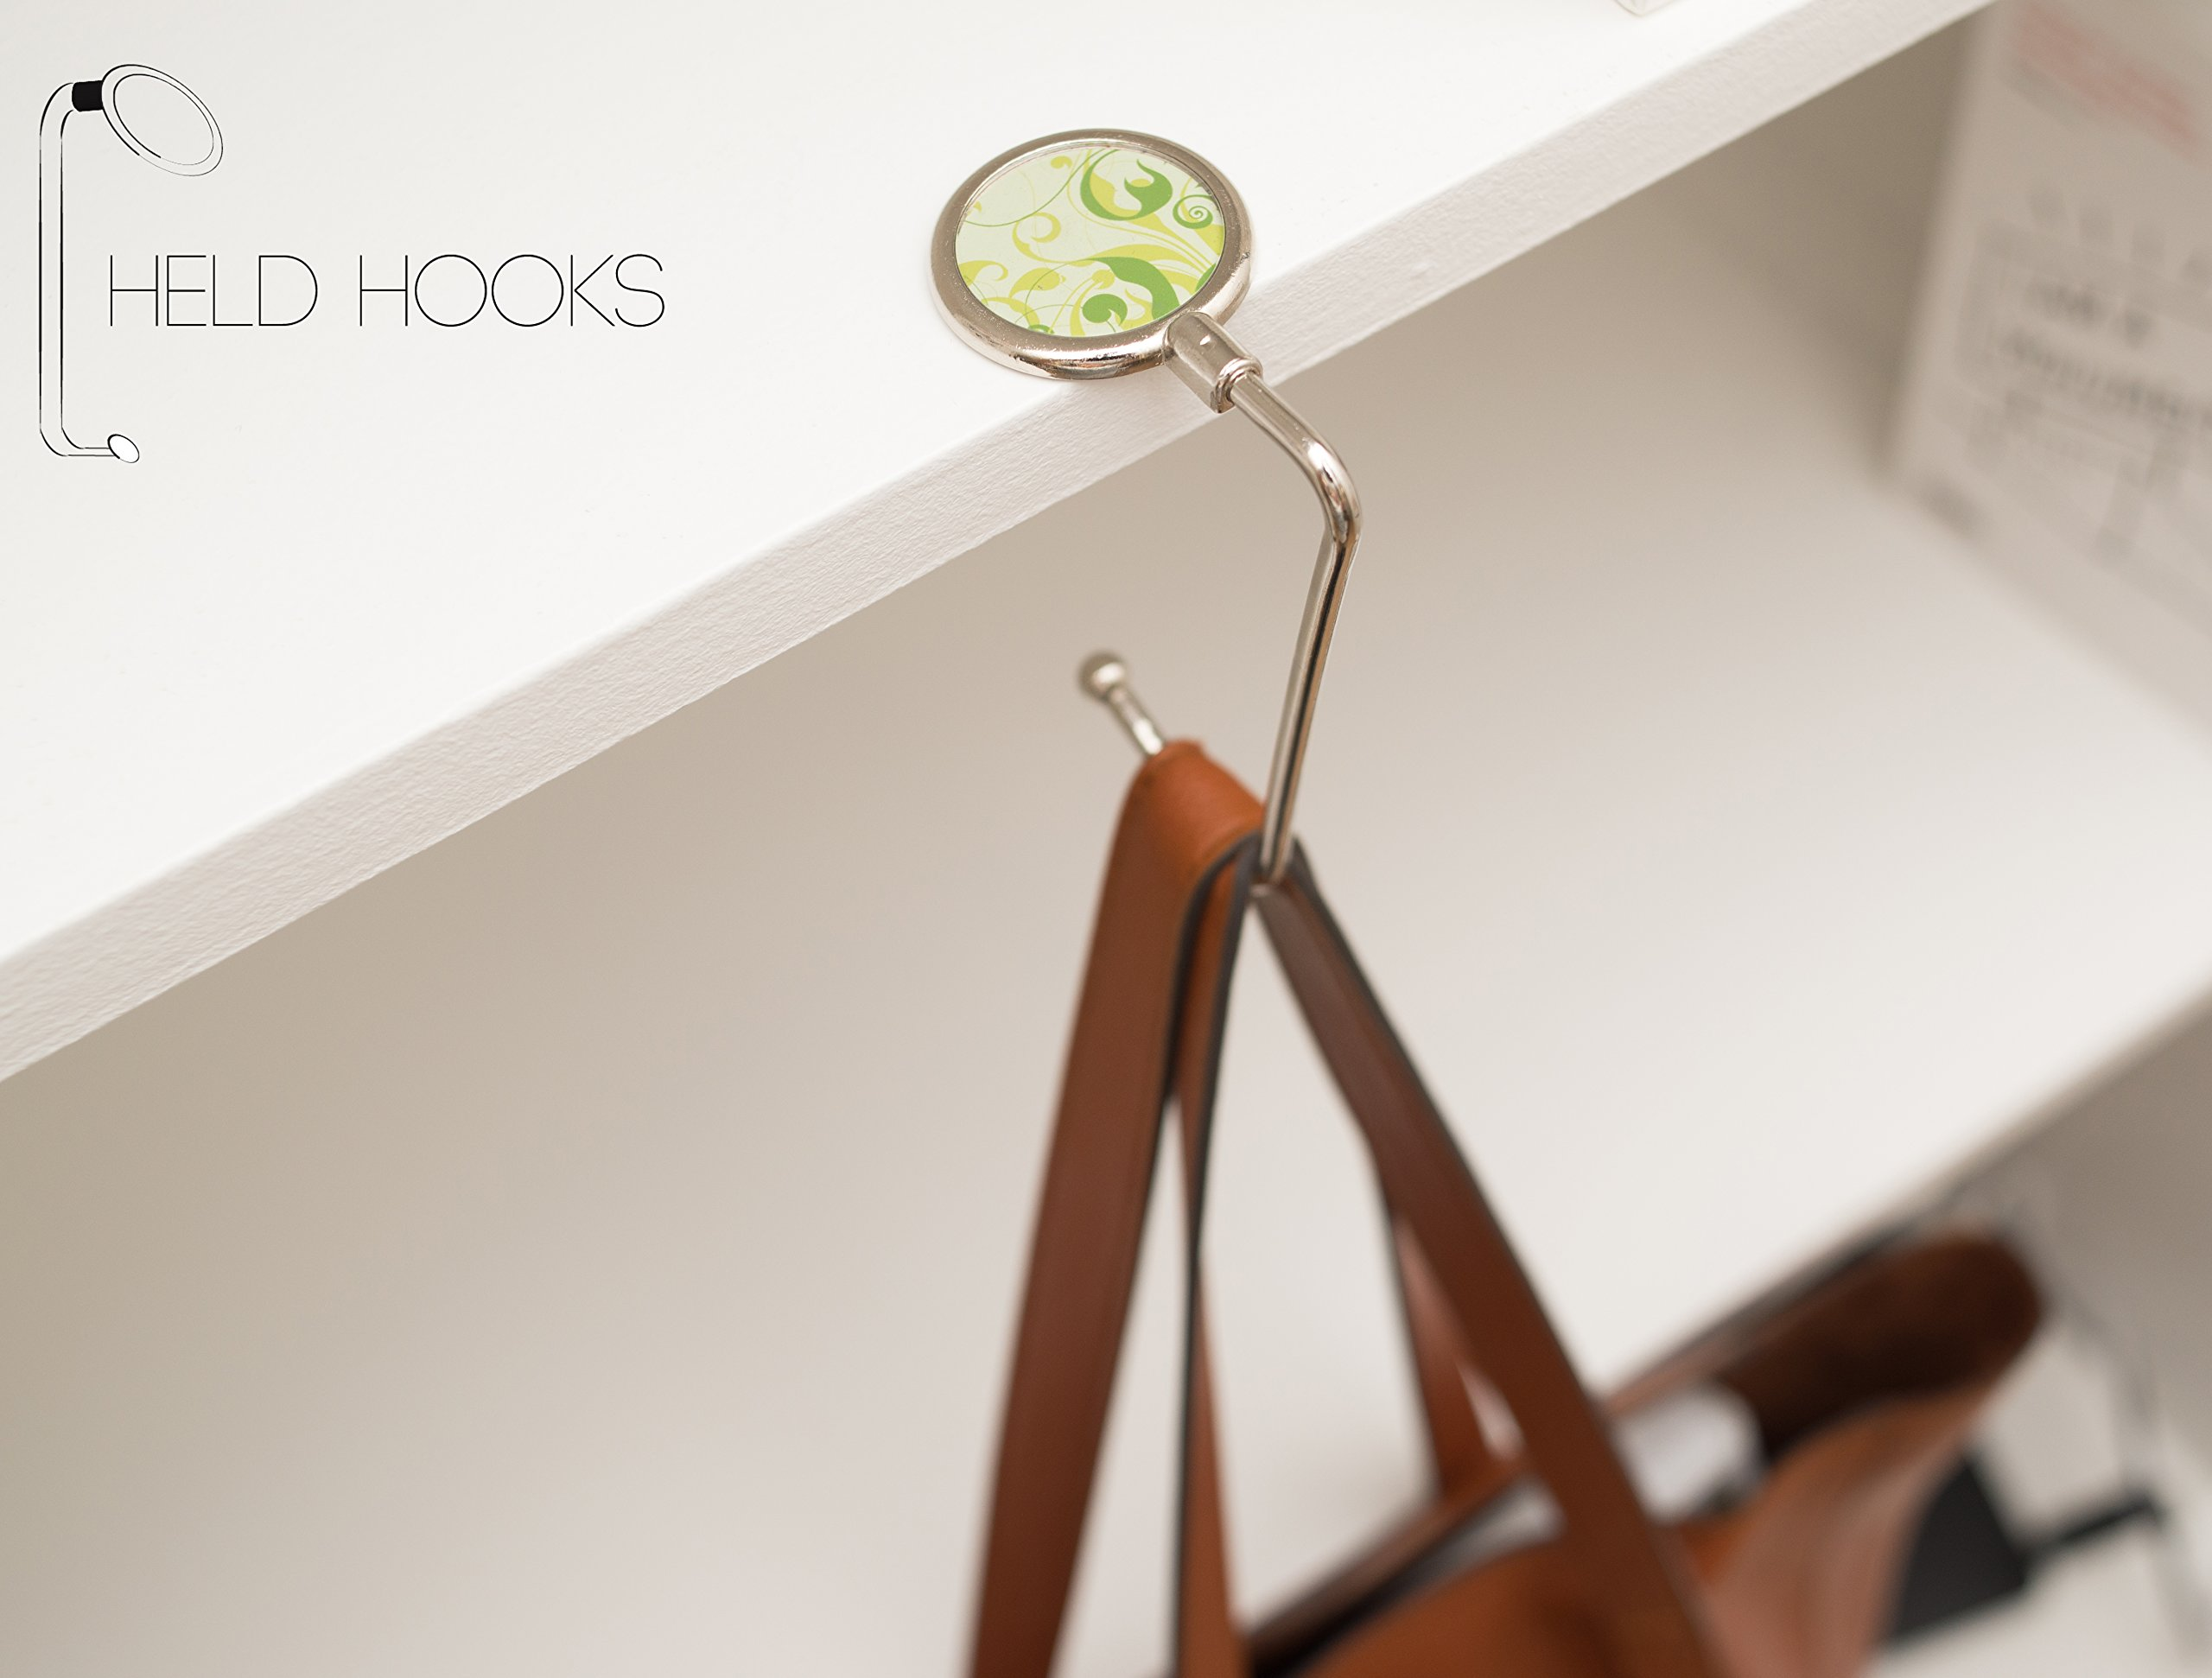 Held Hooks Purse Hanger | Lightweight Handbag Holder For Tables U0026 Desks  (Teal Origami)   BAG 4488 U003c Handbag Hangers U003c Clothing, Shoes U0026 Jewelry    TIBS